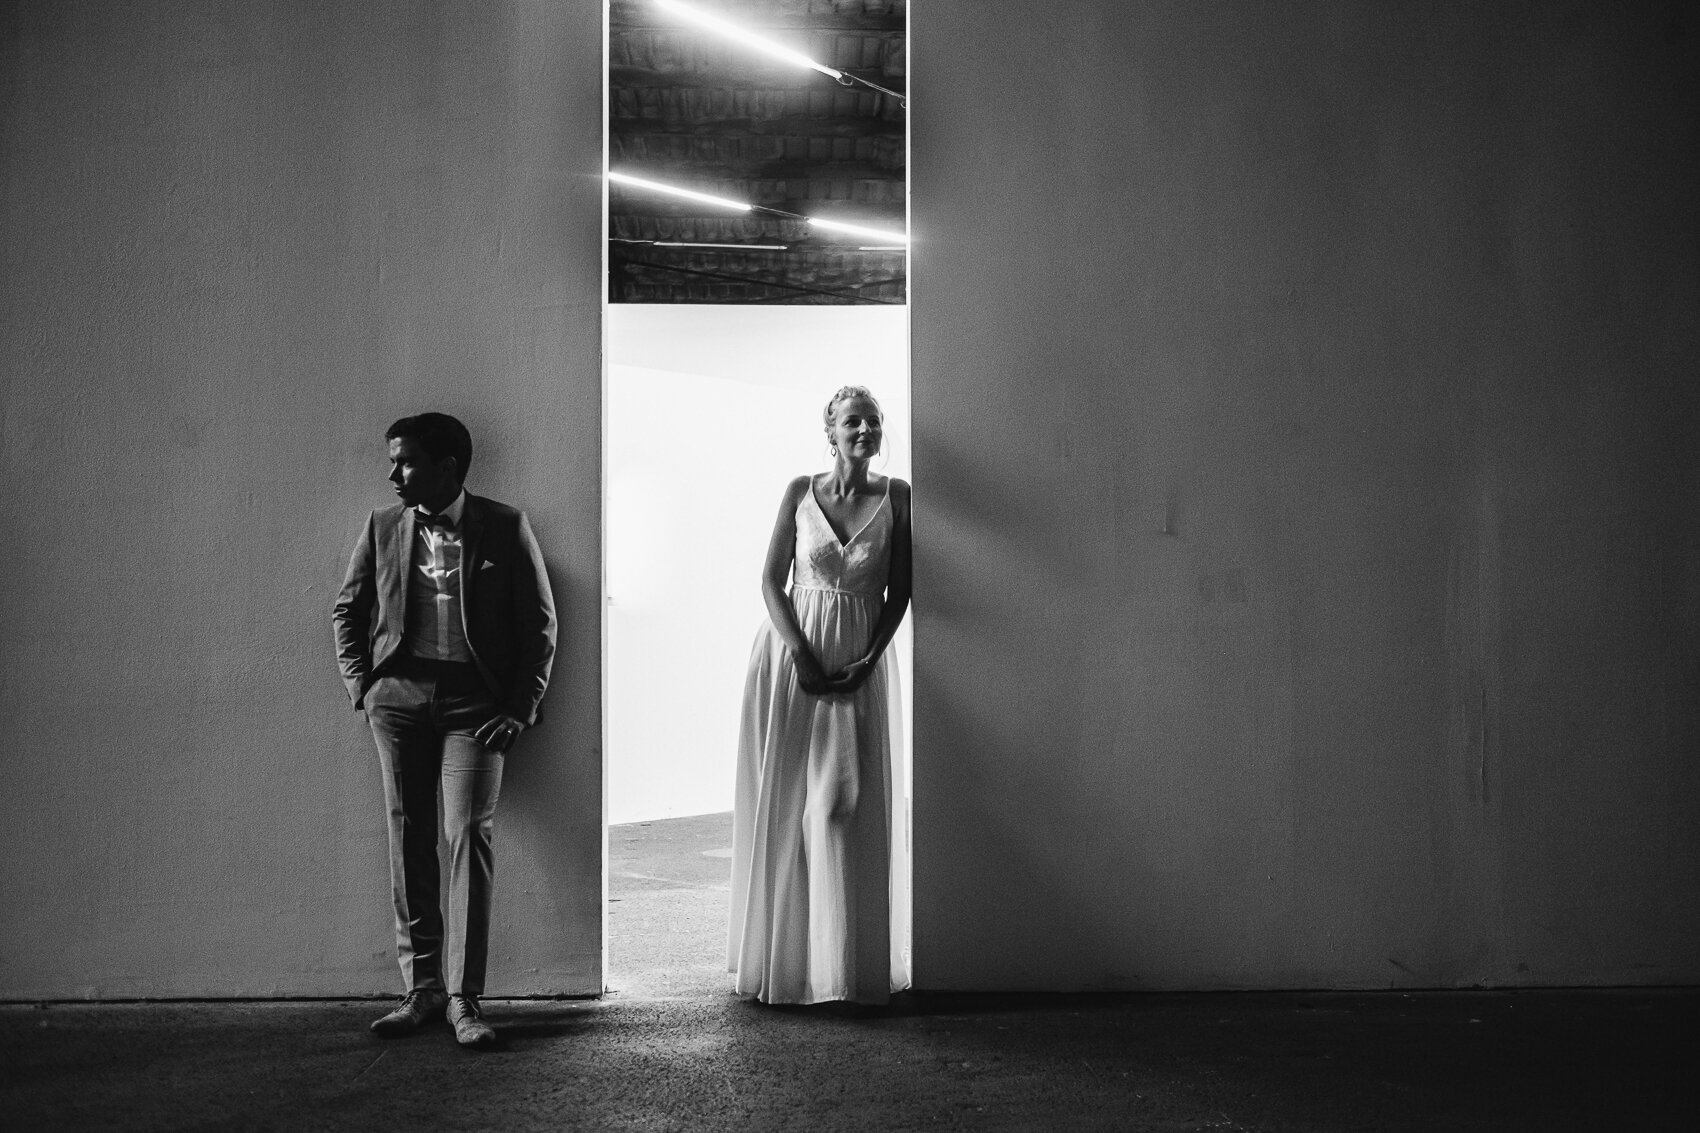 iso800 - huwelijksfotograaf isabo matthias verbeke foundation-13.jpg